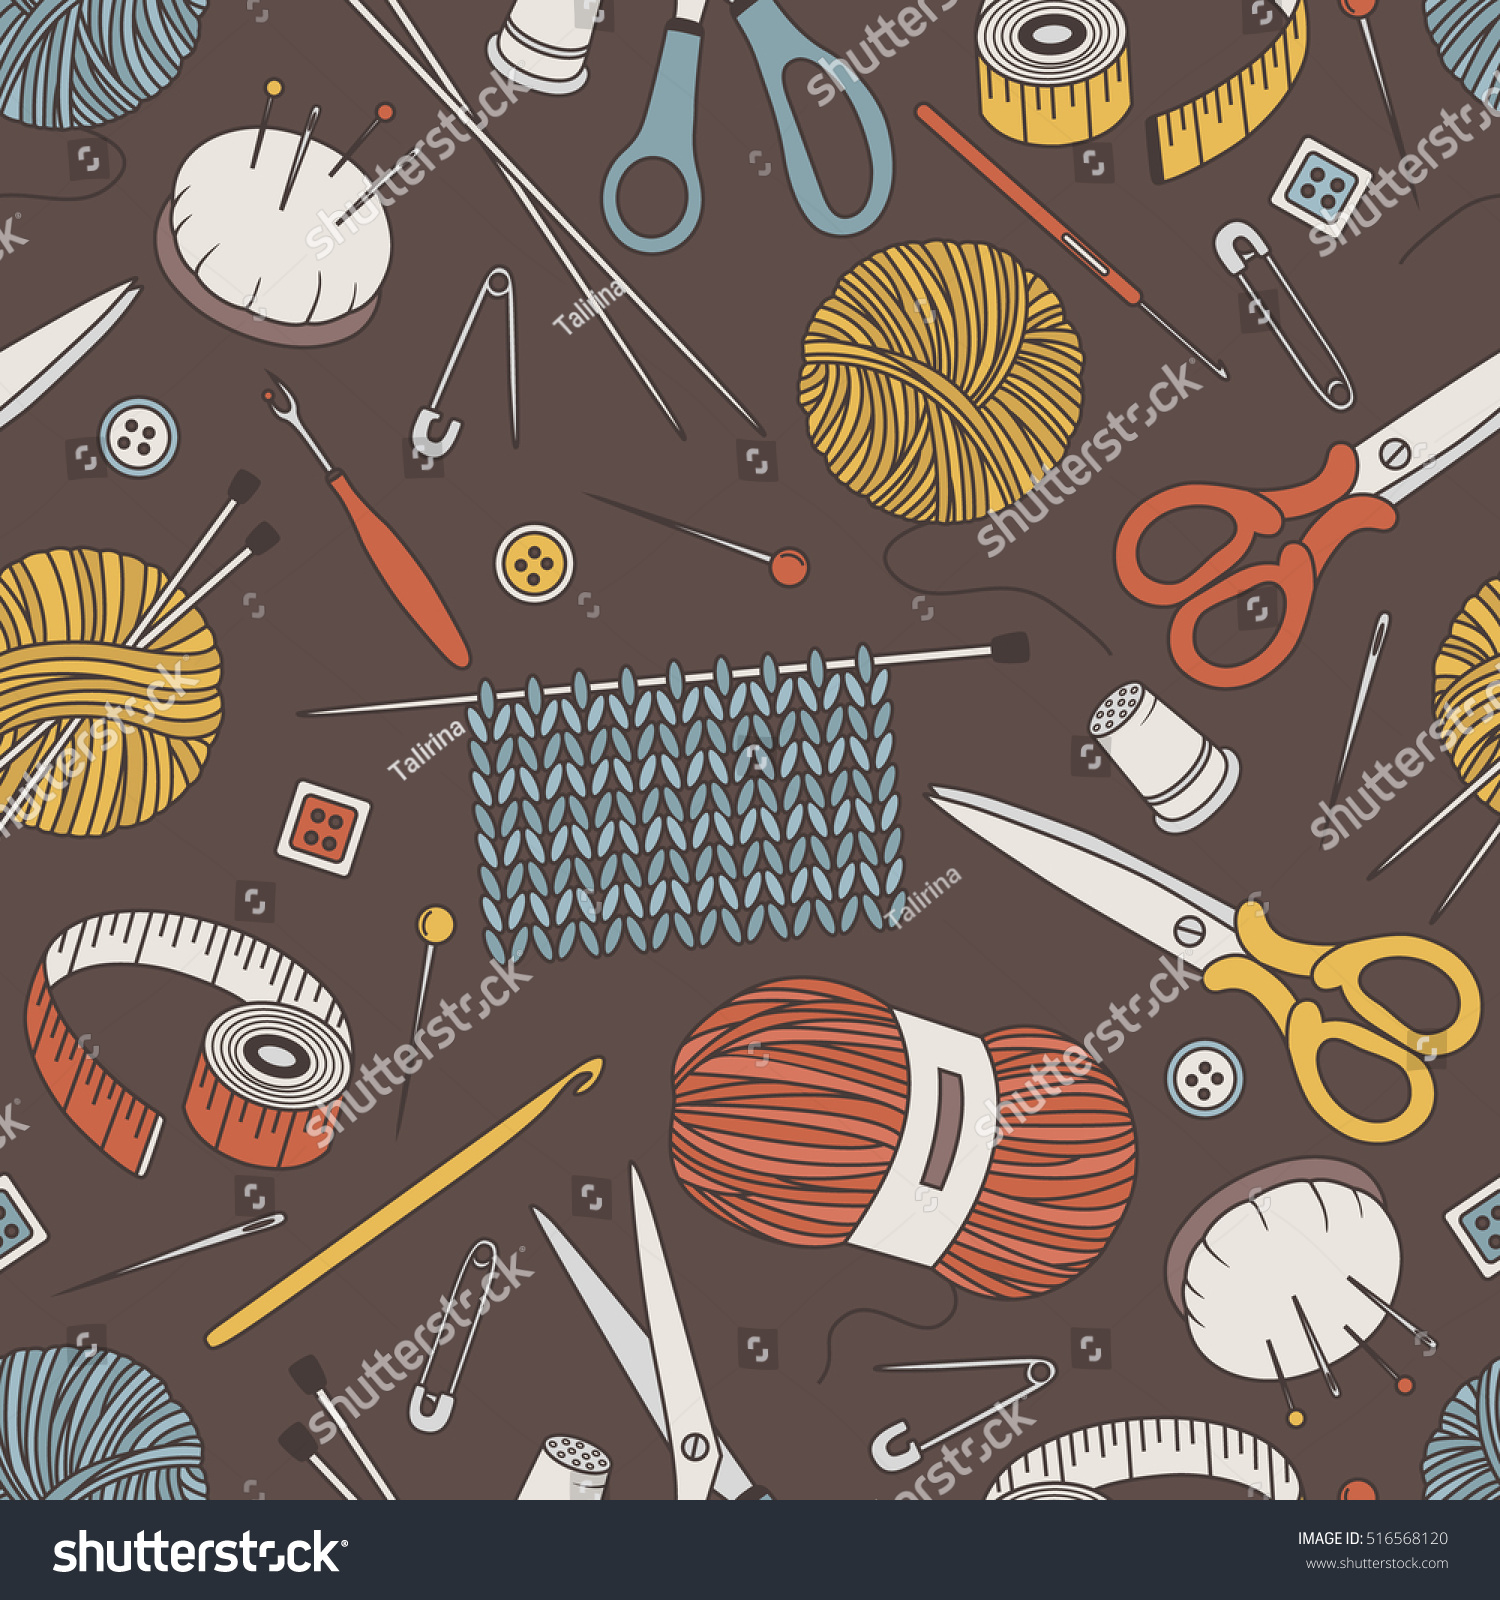 Seamless Pattern Tools Knitting Crochet Hand Stock Vector Royalty Free 516568120